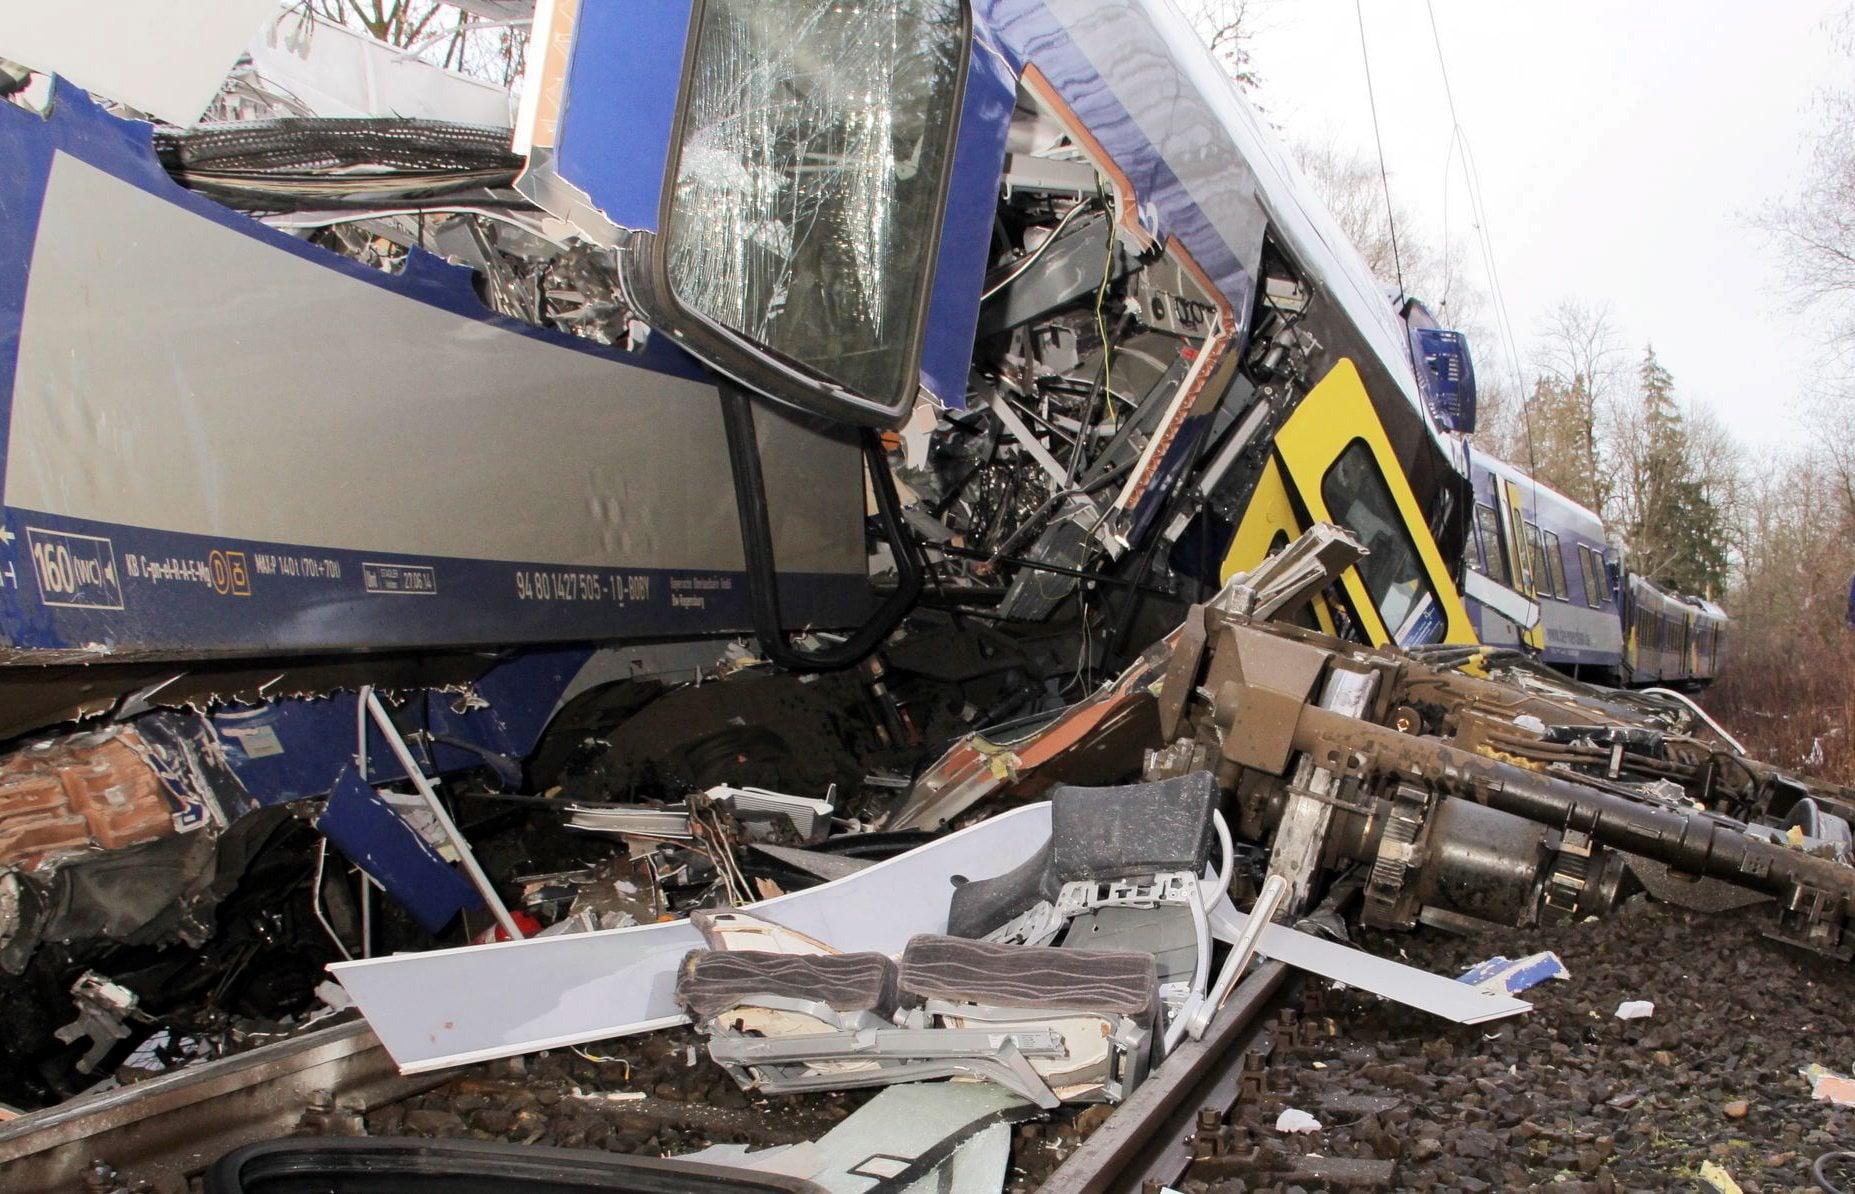 Train crash in Germany kills at least 10, injures 80